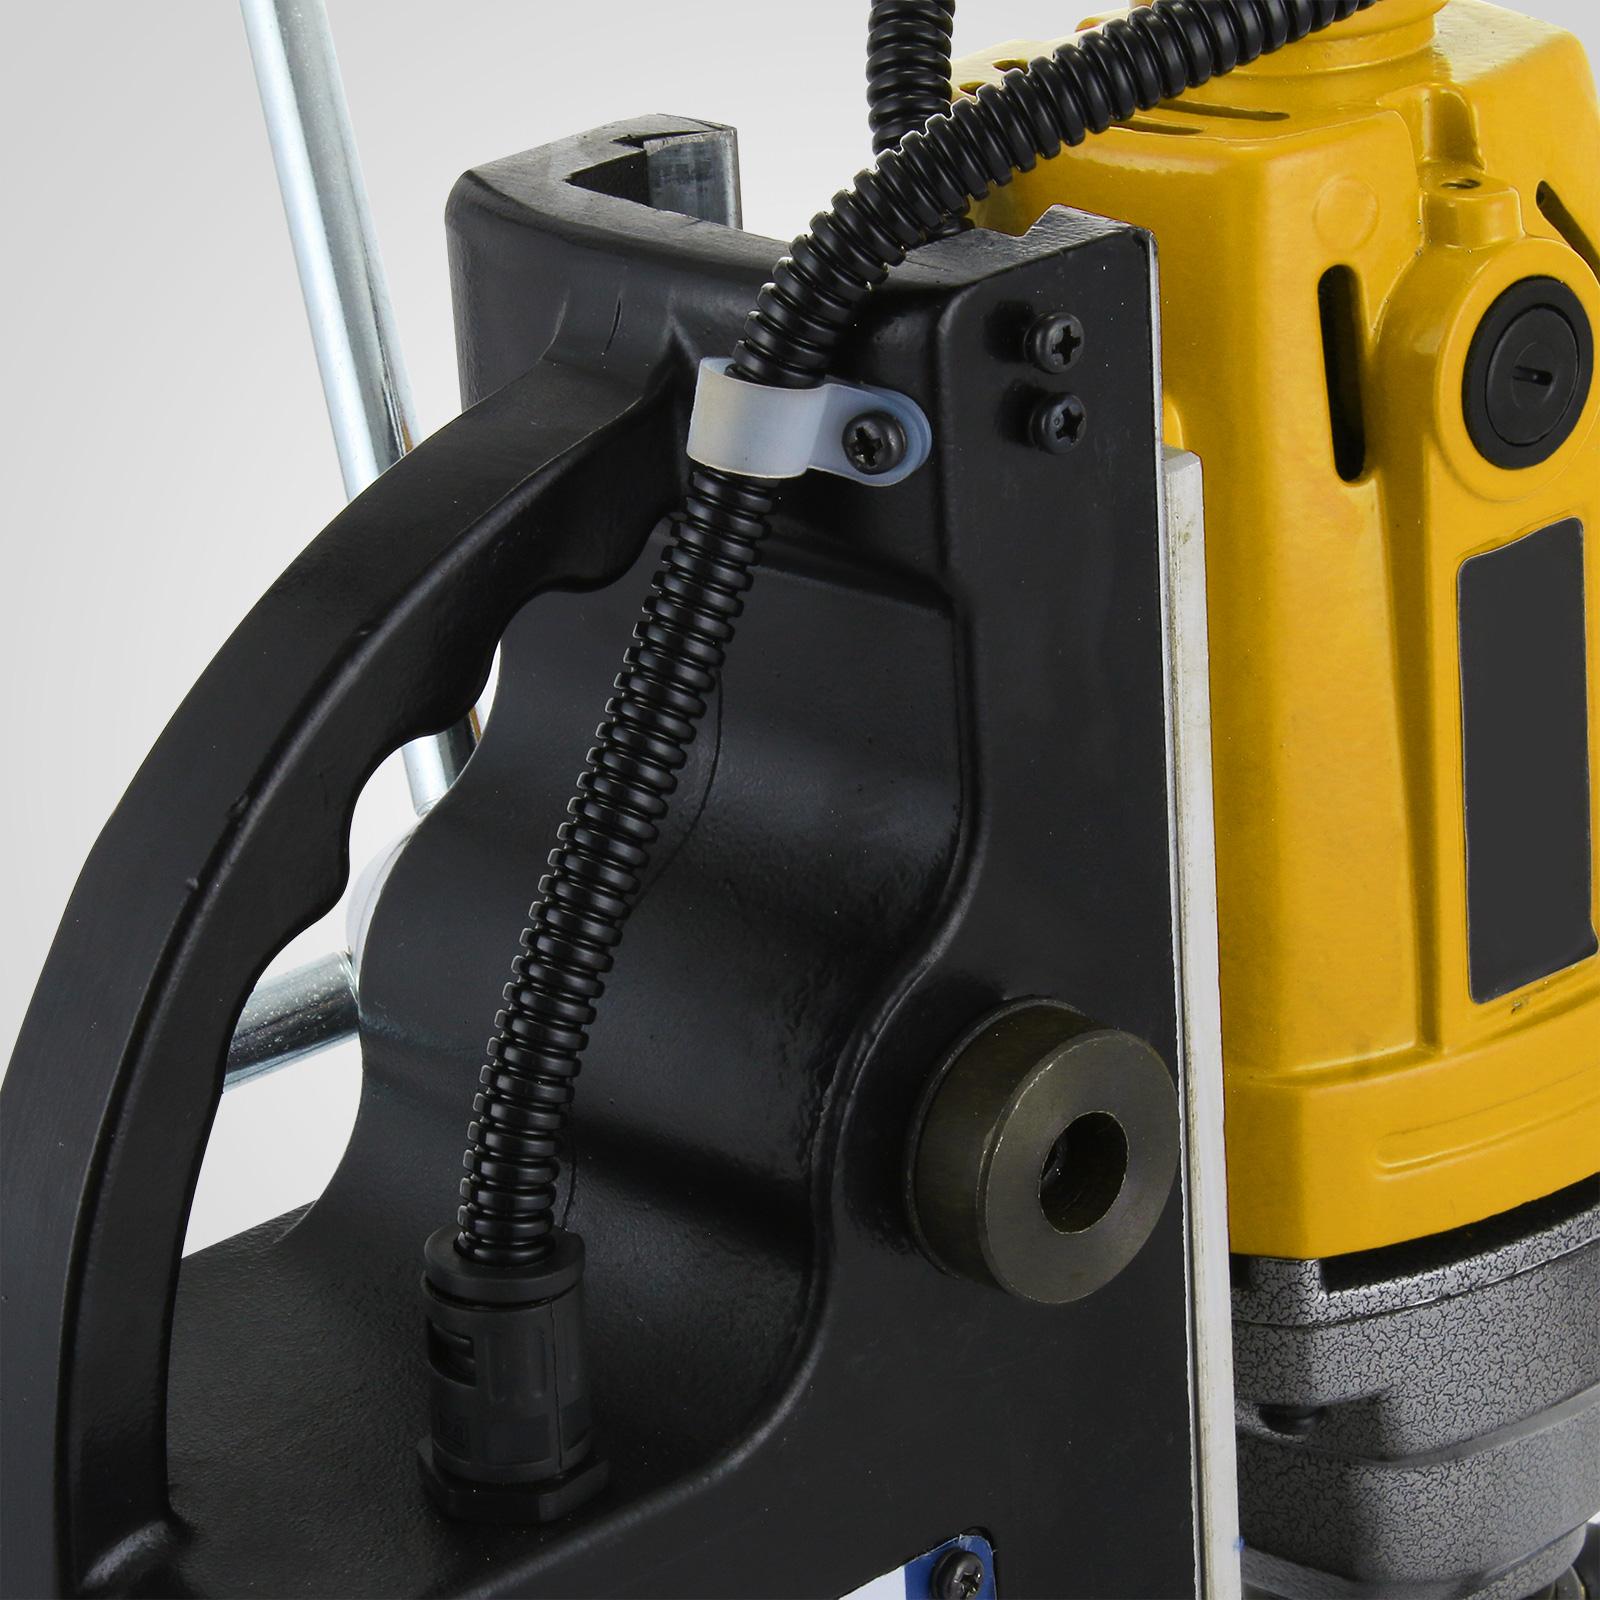 MB23-BRM35-MD40-Trapano-Perforatrice-Carotatore-Fresa-Magnetico-12-40mm-230V miniatura 23